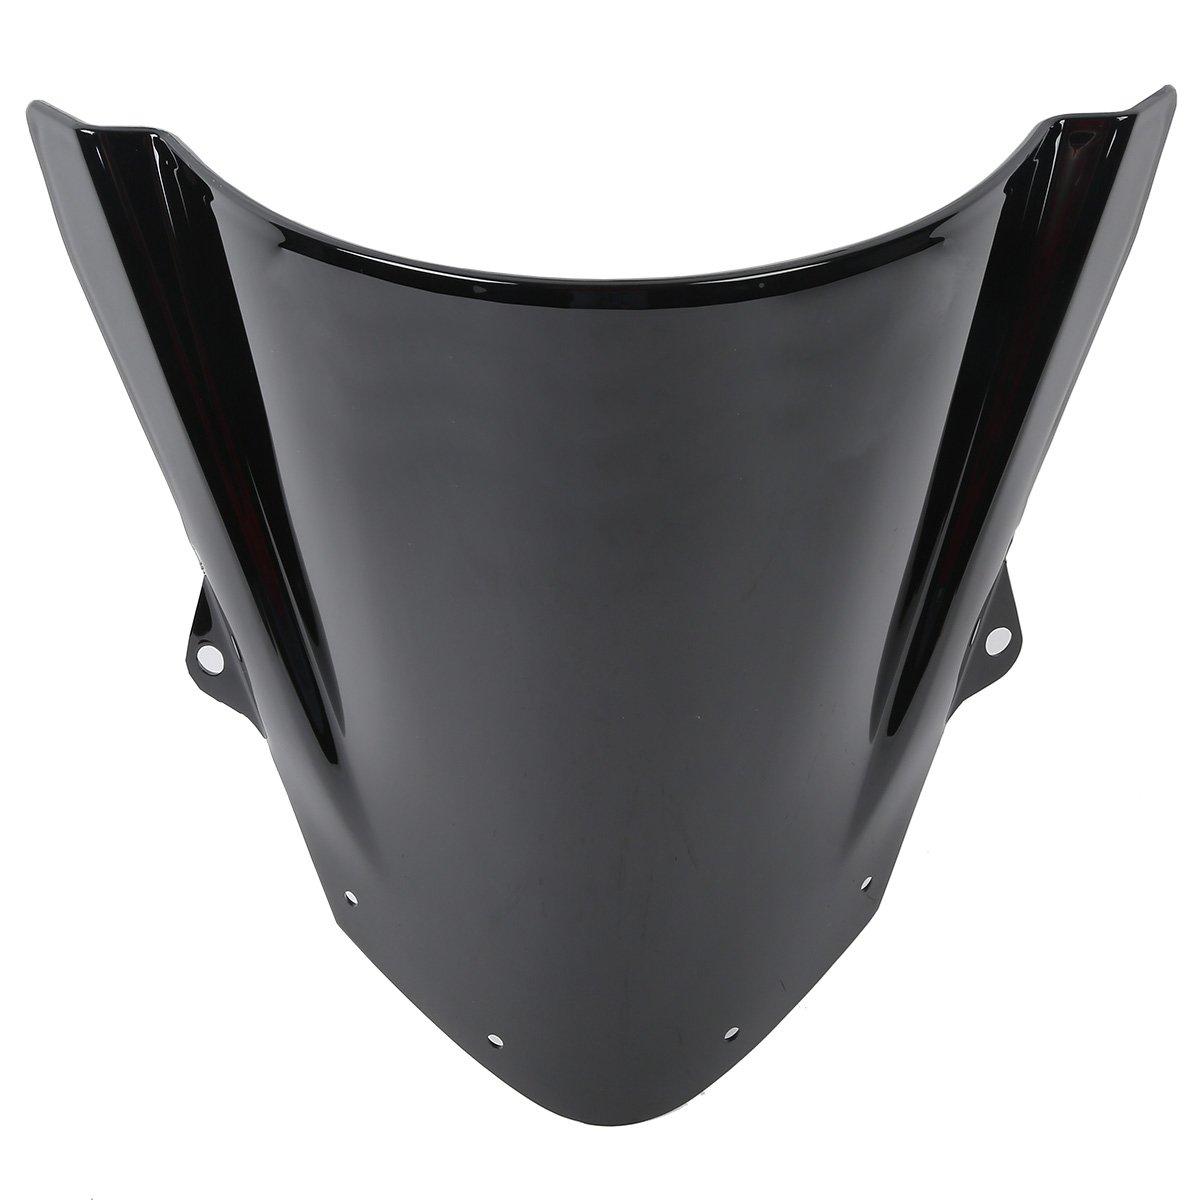 XFMT Black Windshield Windscreen Compatible with Honda CBR 600 F4 1999-2000 Double Bubble